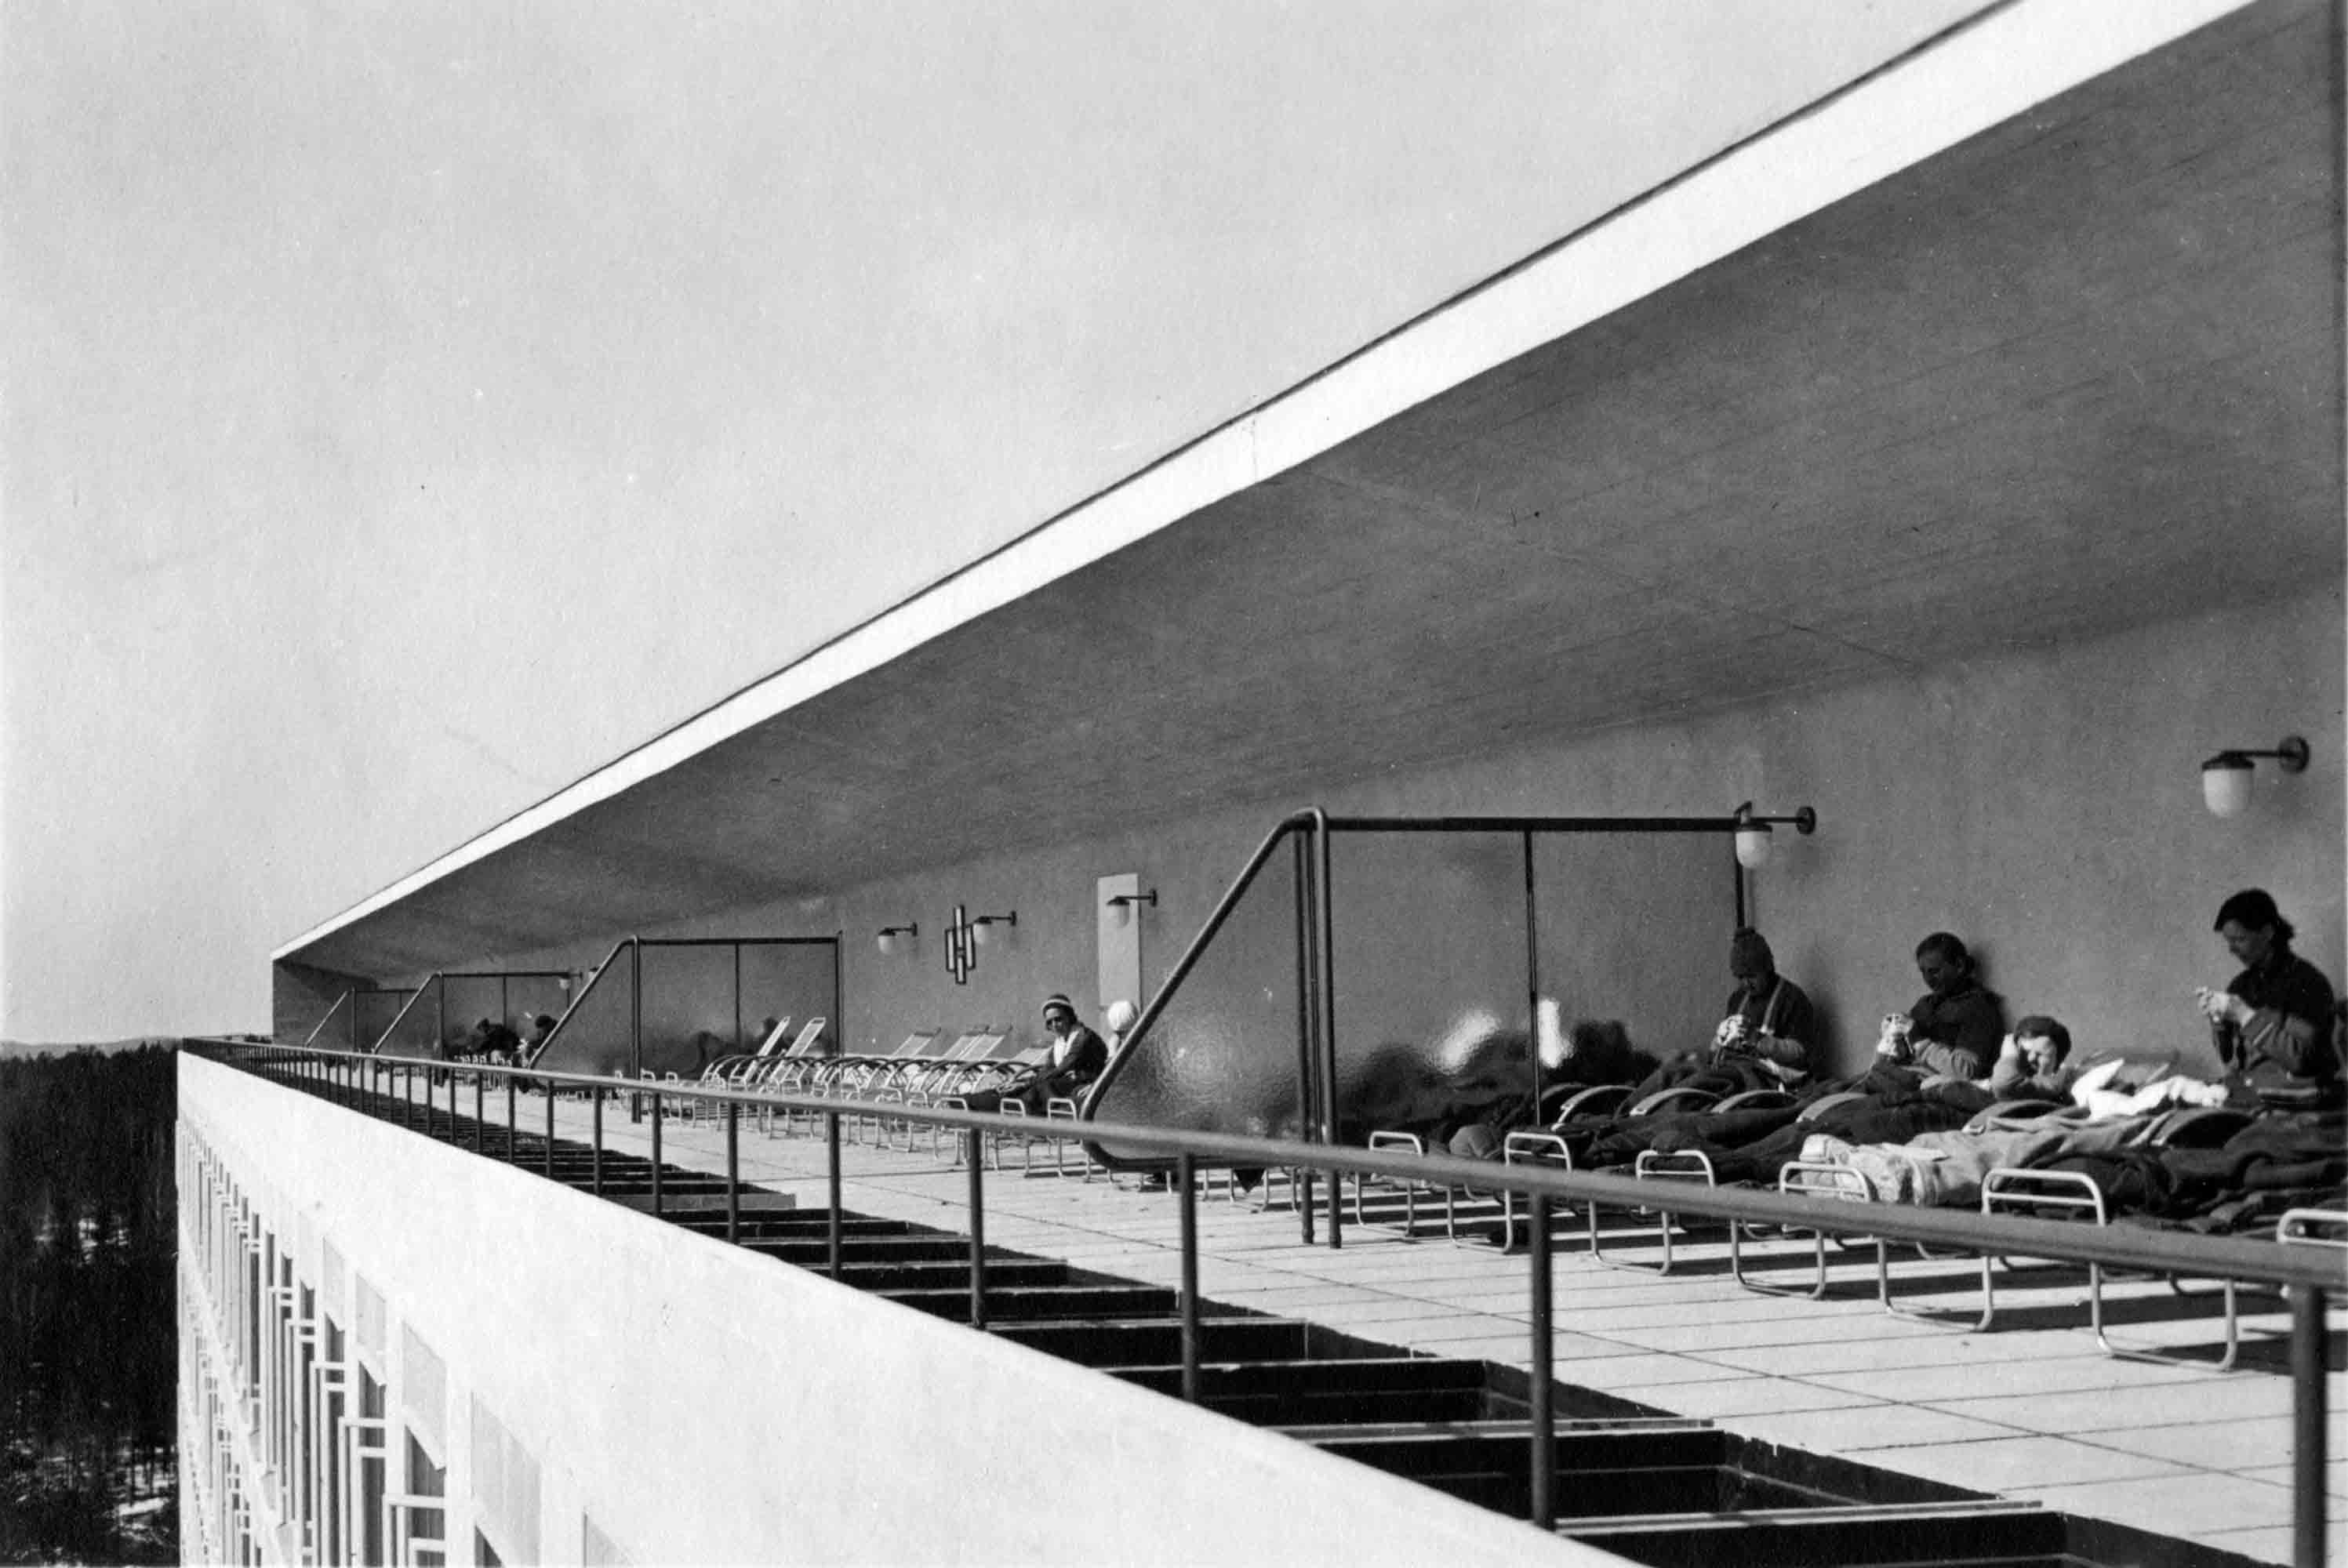 Sanatorium pour tuberculeux ©Alvar Aalto Museum